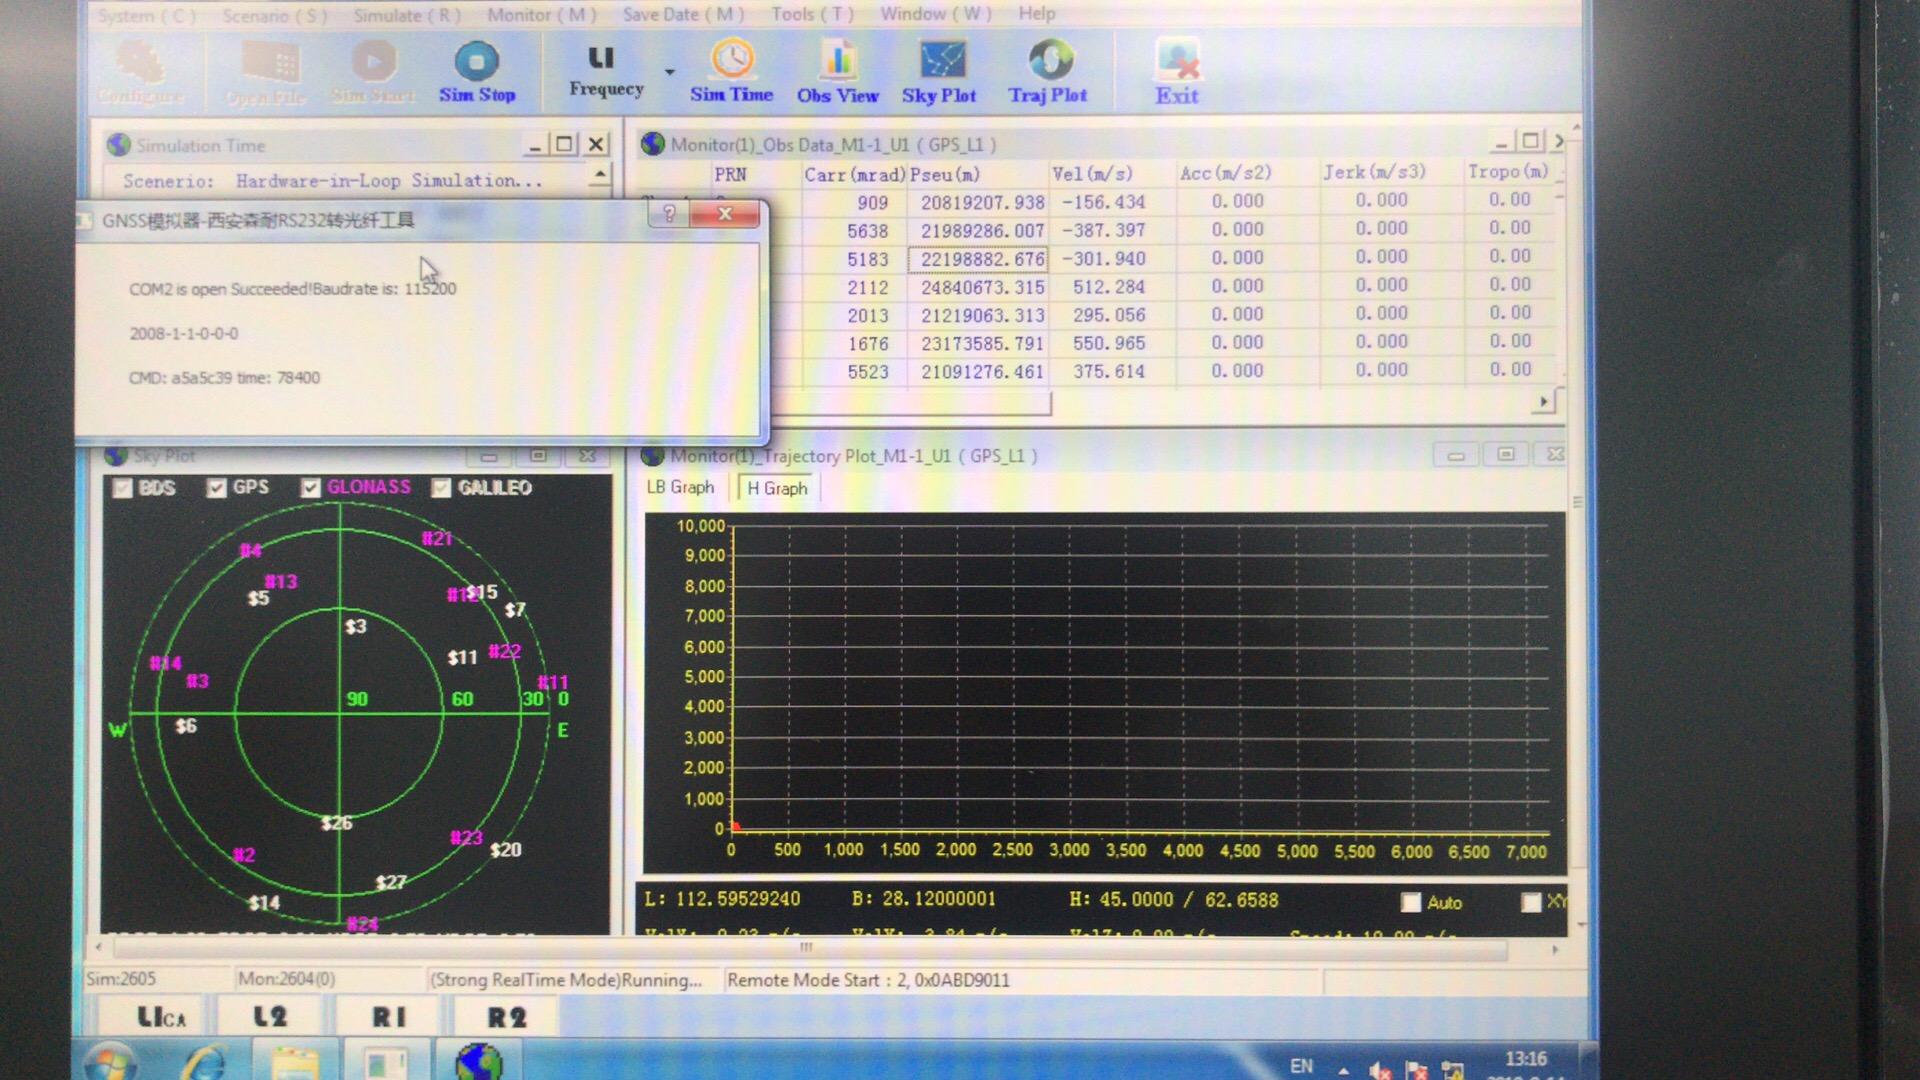 GNSS satellite signal simulator, GNSS simulator, multi-channel simulator